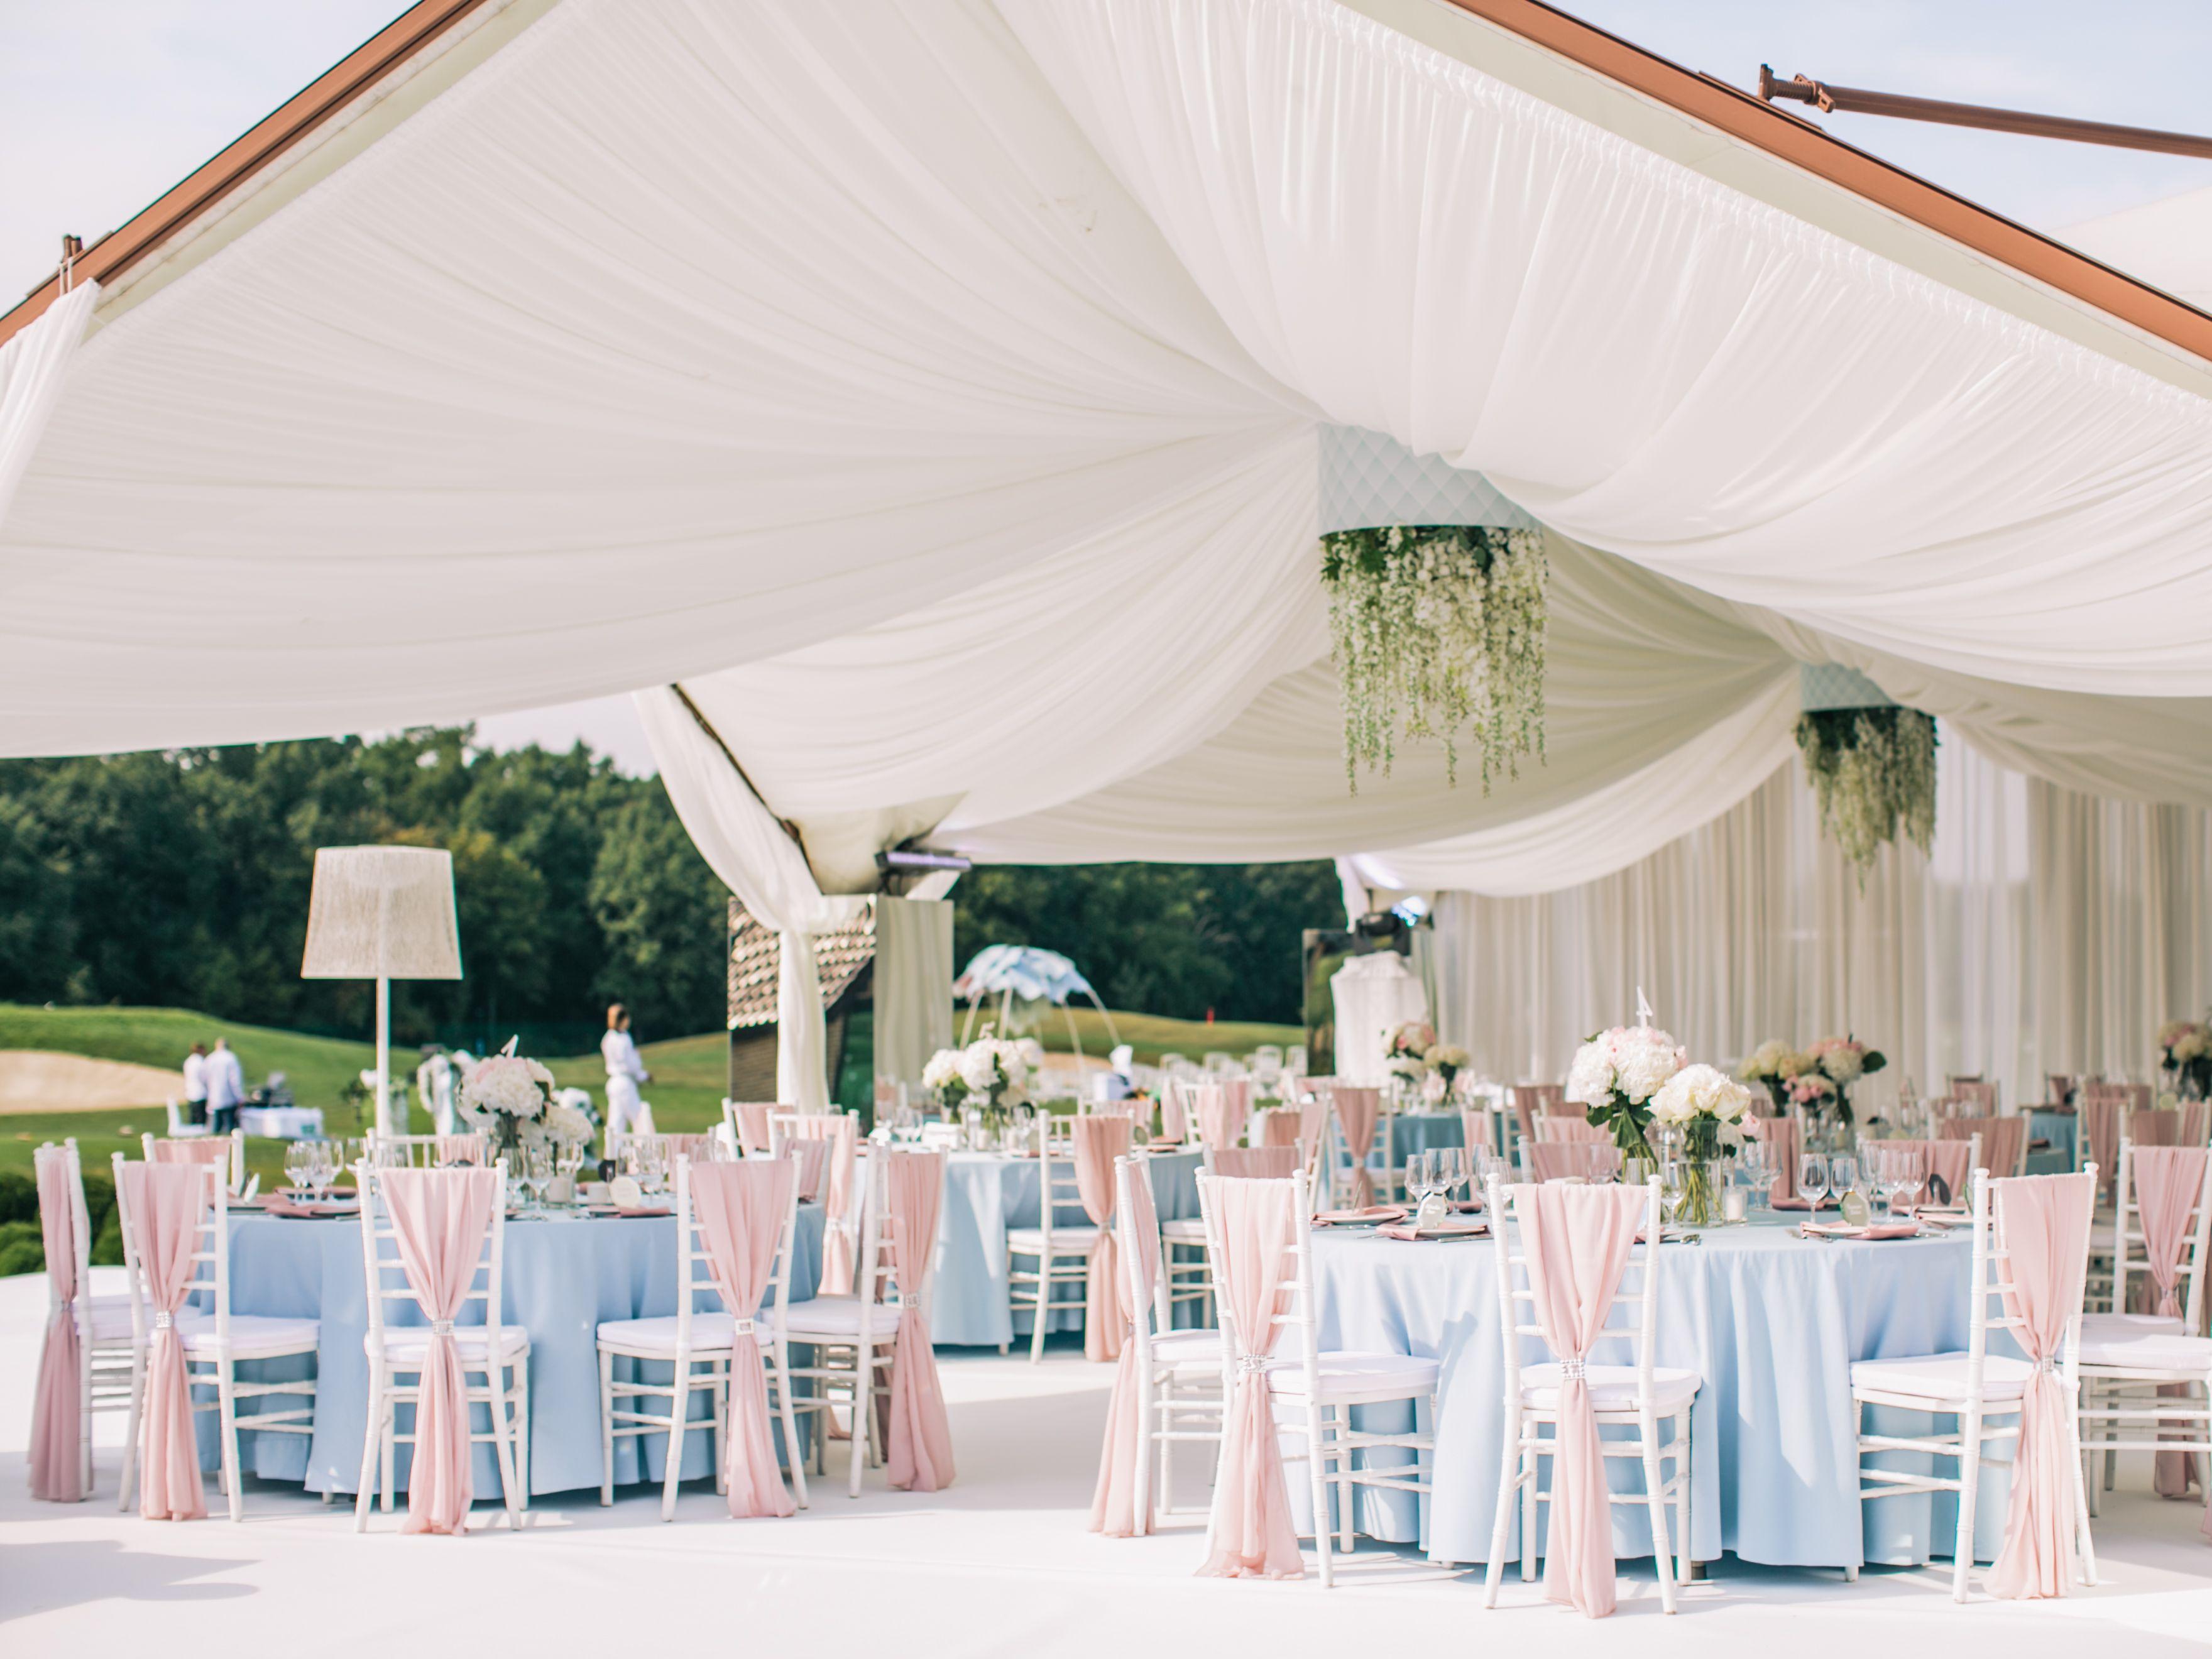 Wedding space for guests wedding ceremony wedding decor wedding summer wedding